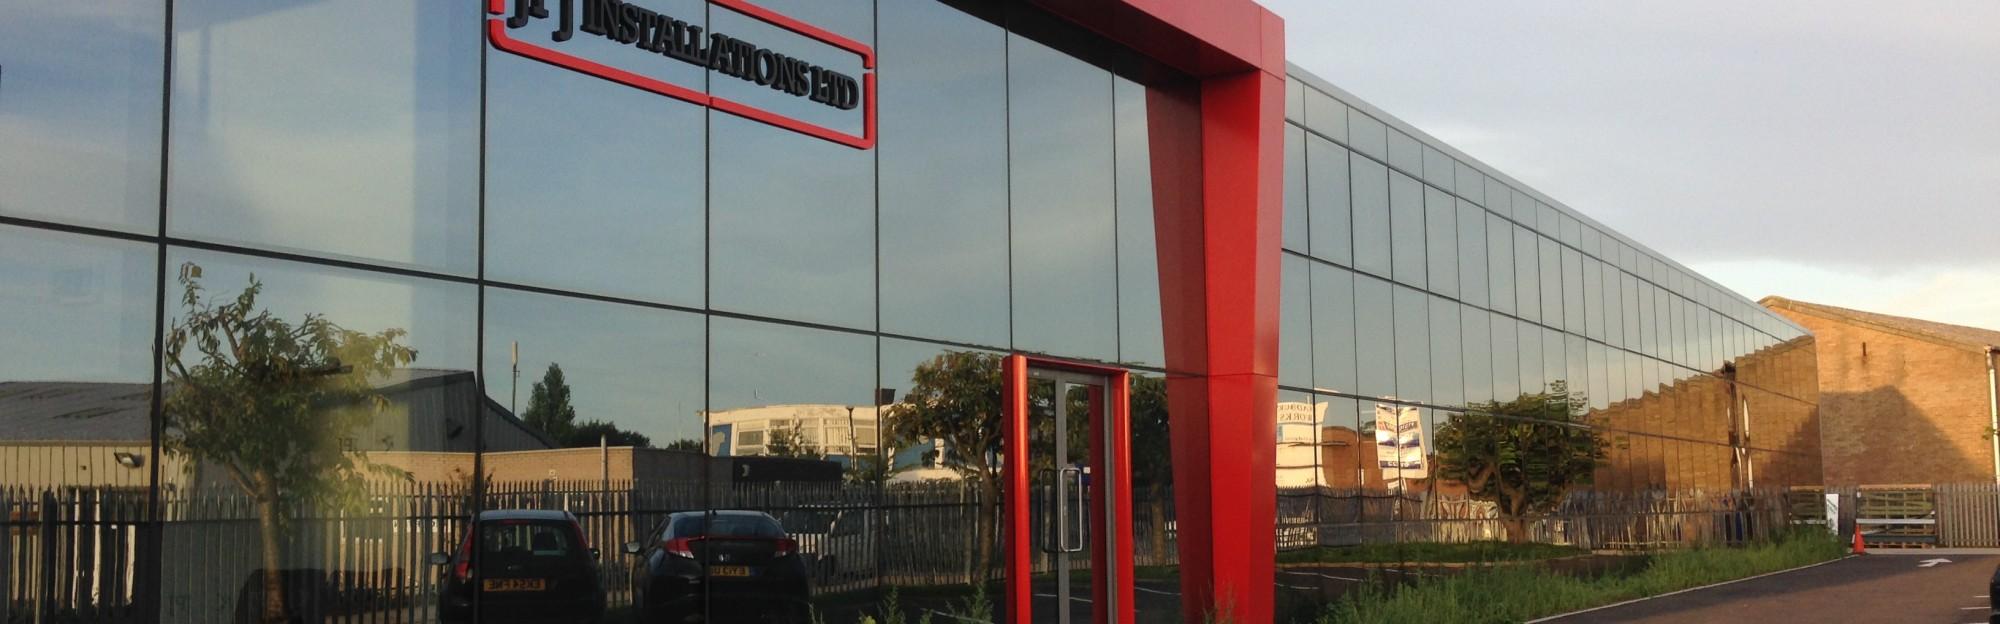 JPJ Installations Ltd